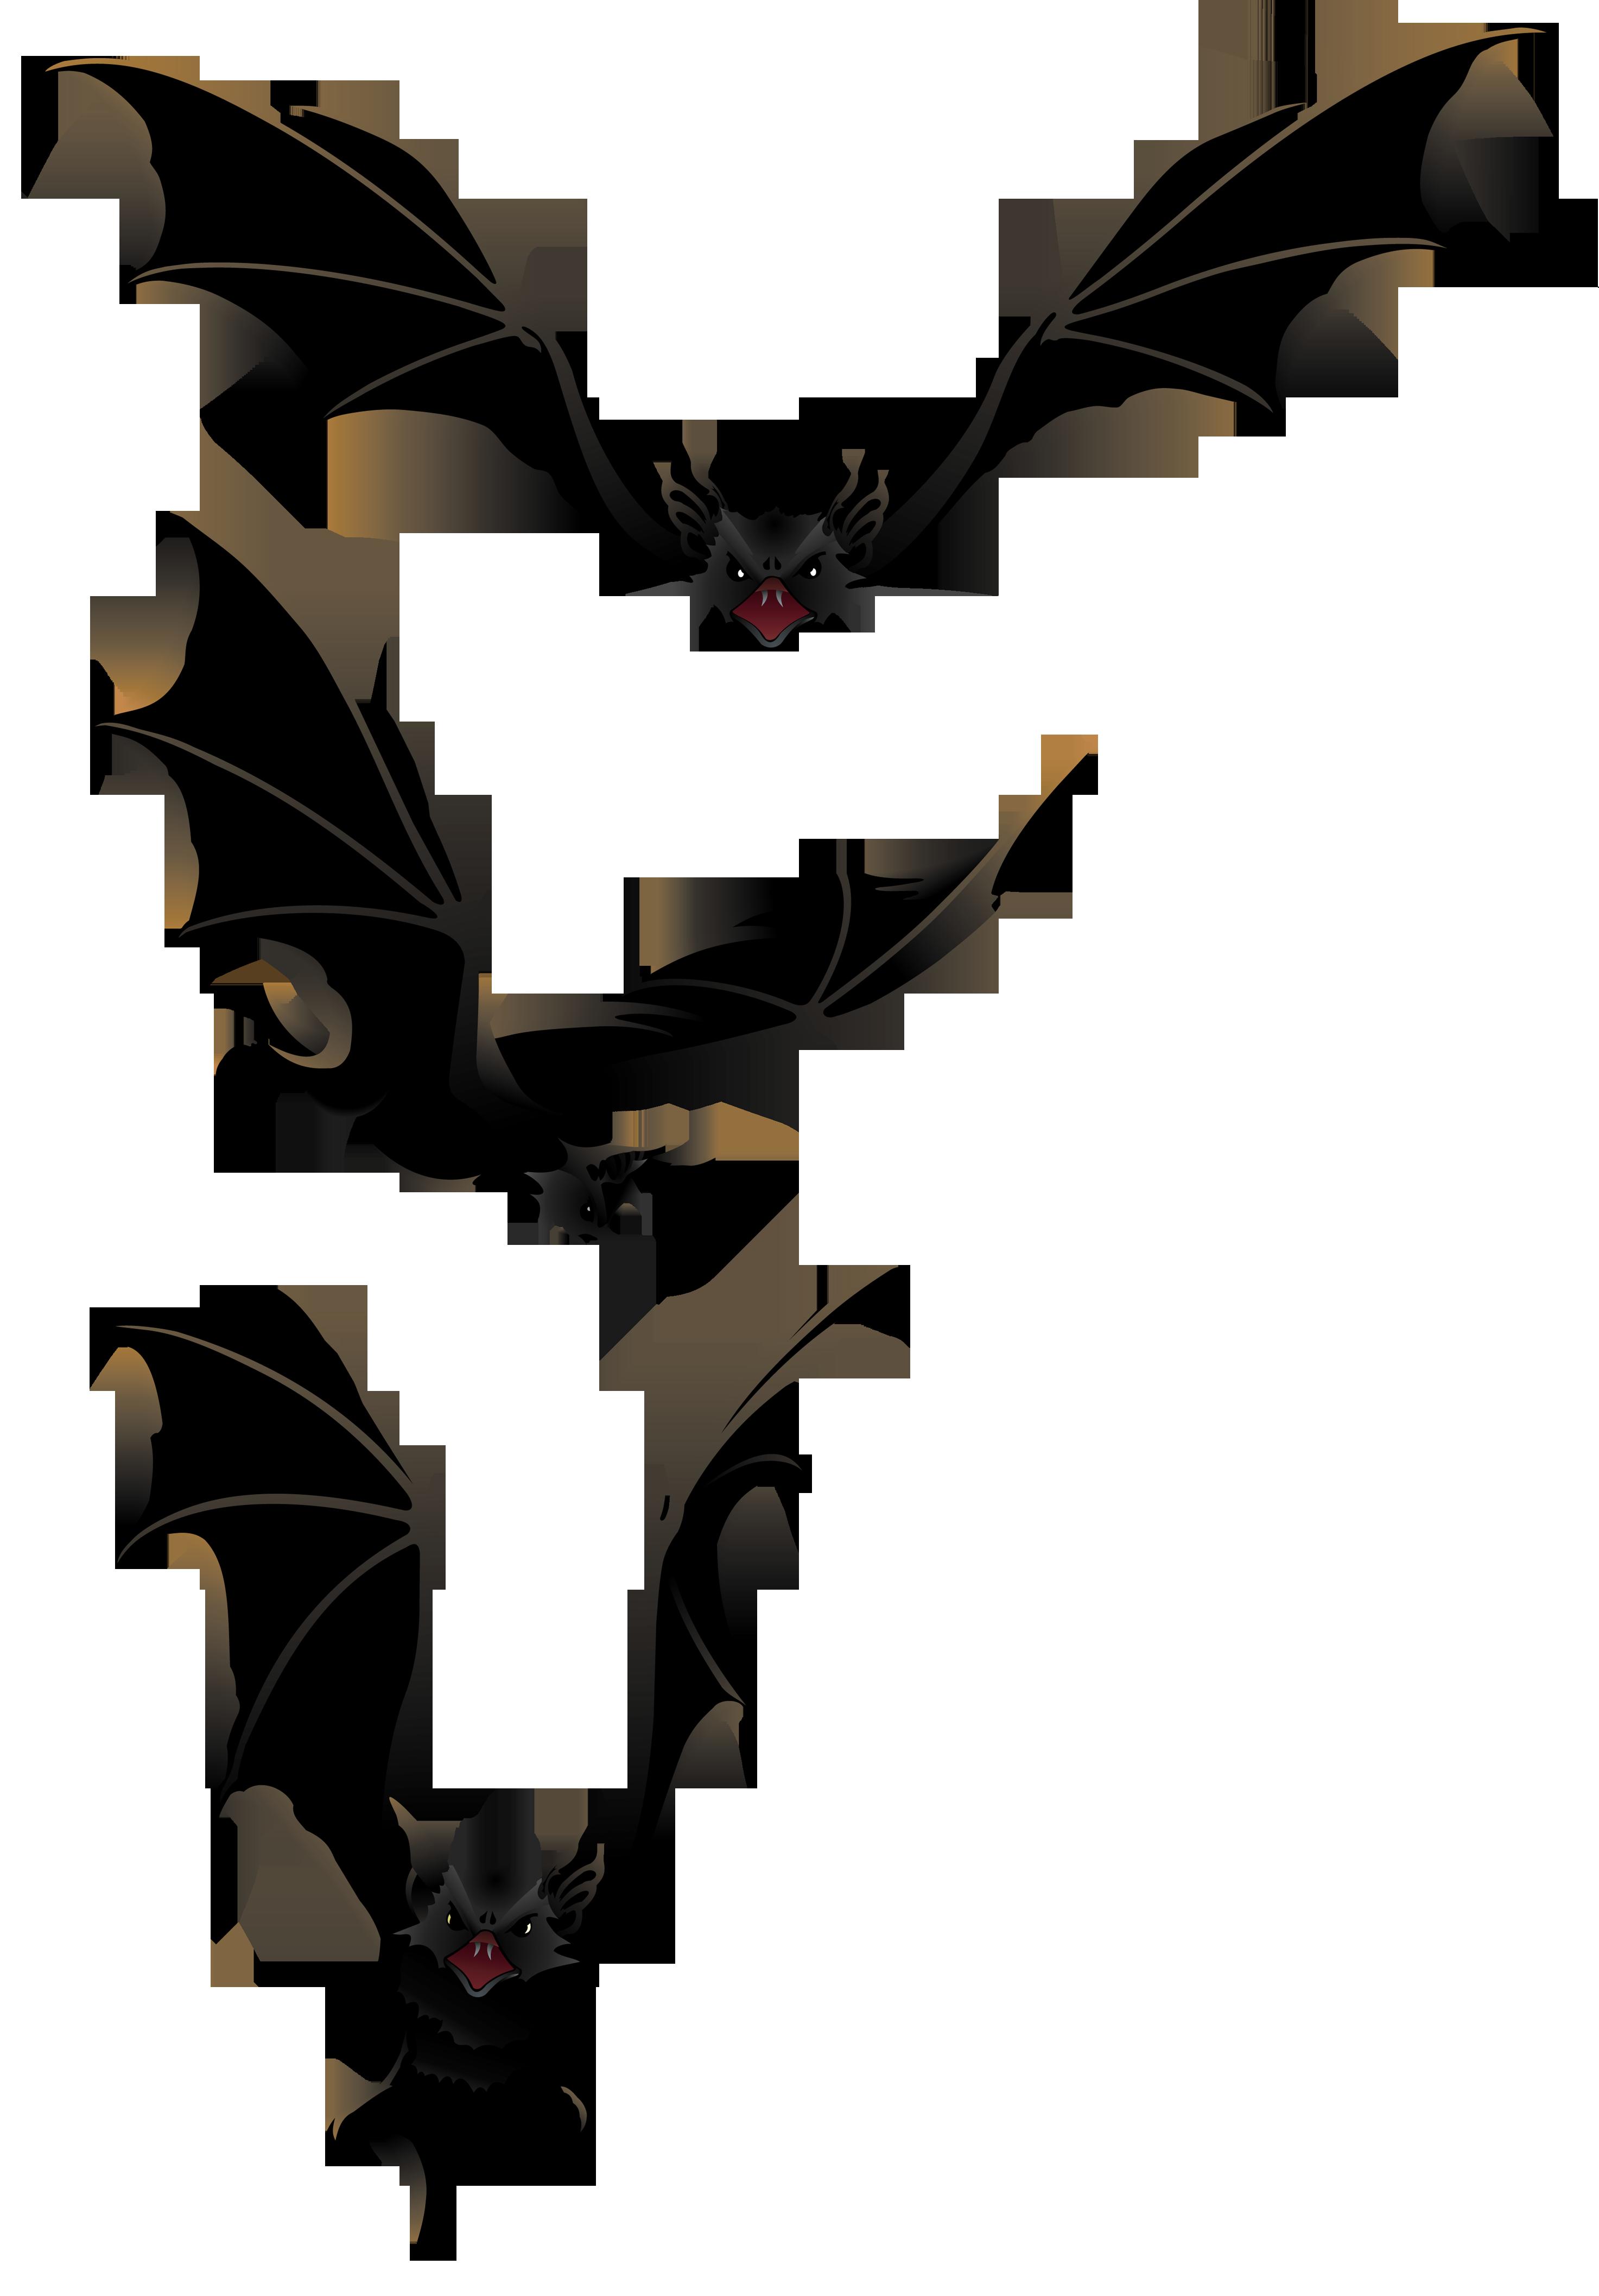 Png bats gallery yopriceville. Halloween clipart corner